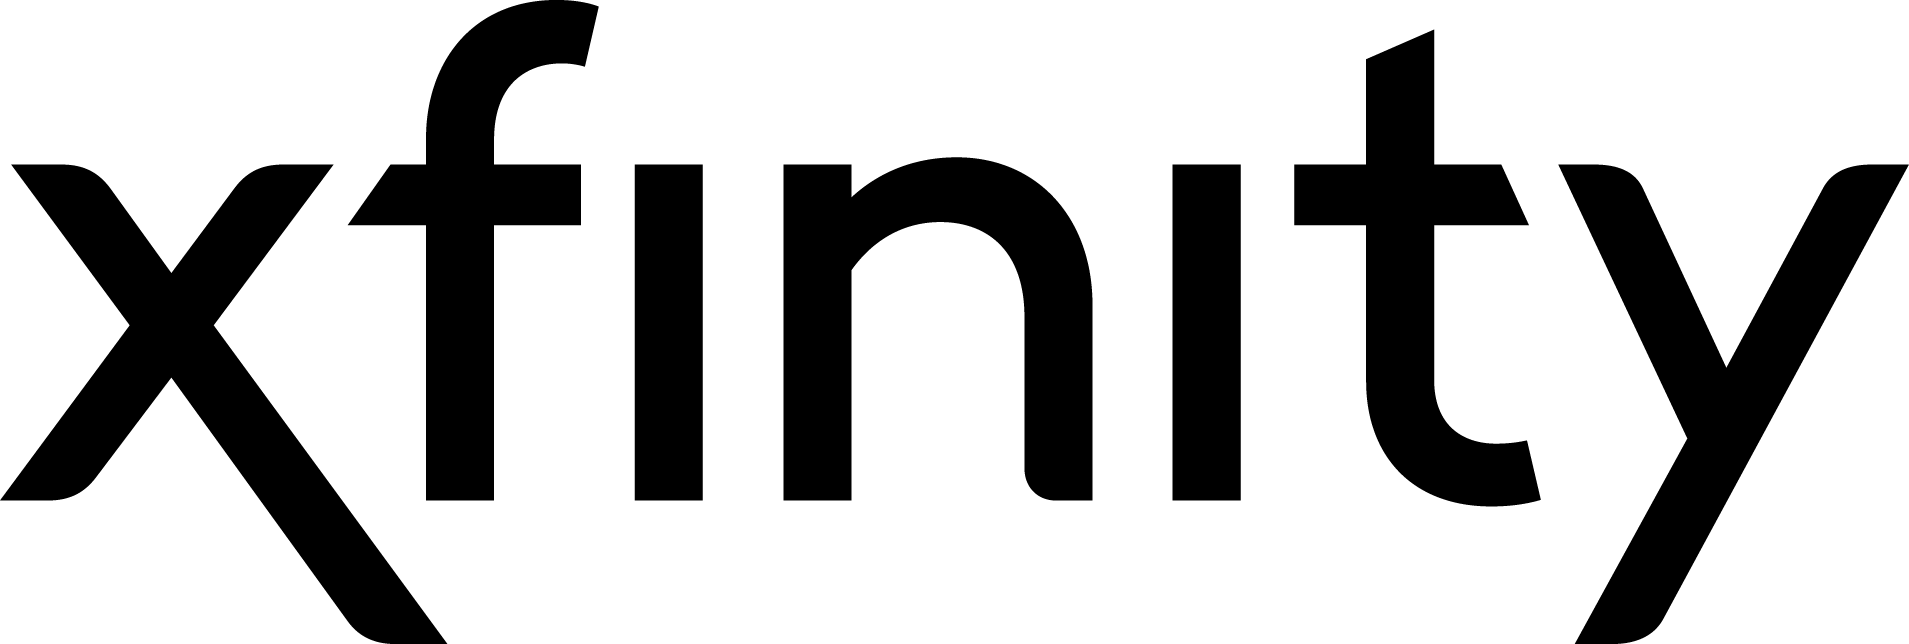 logo for xfinity